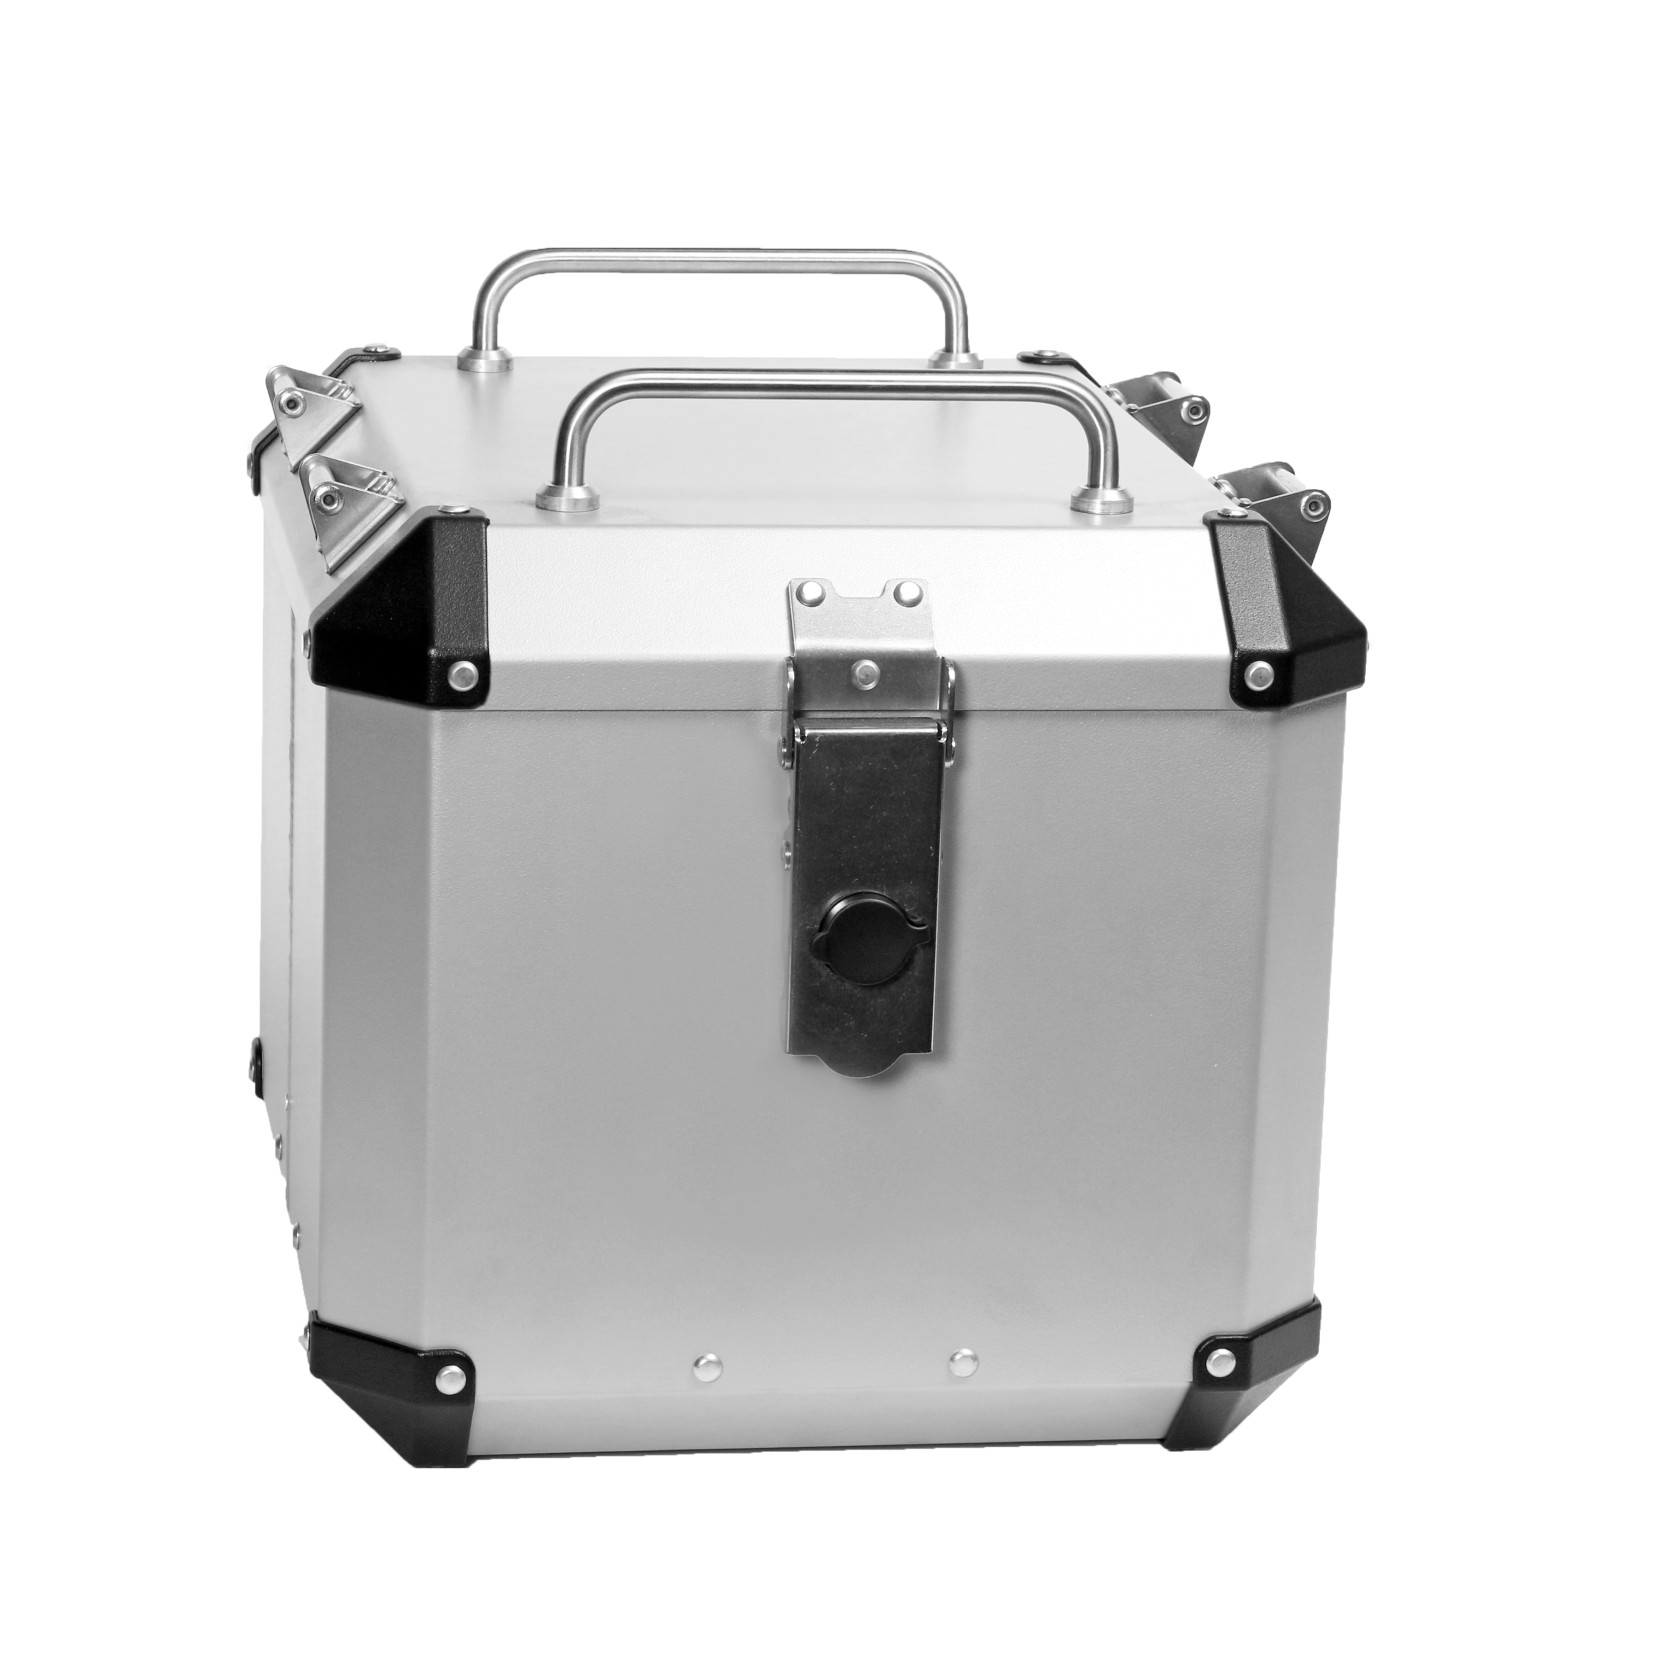 MyTech TOP CASE 33 ltr with Rack - Aluminium ---SAVE